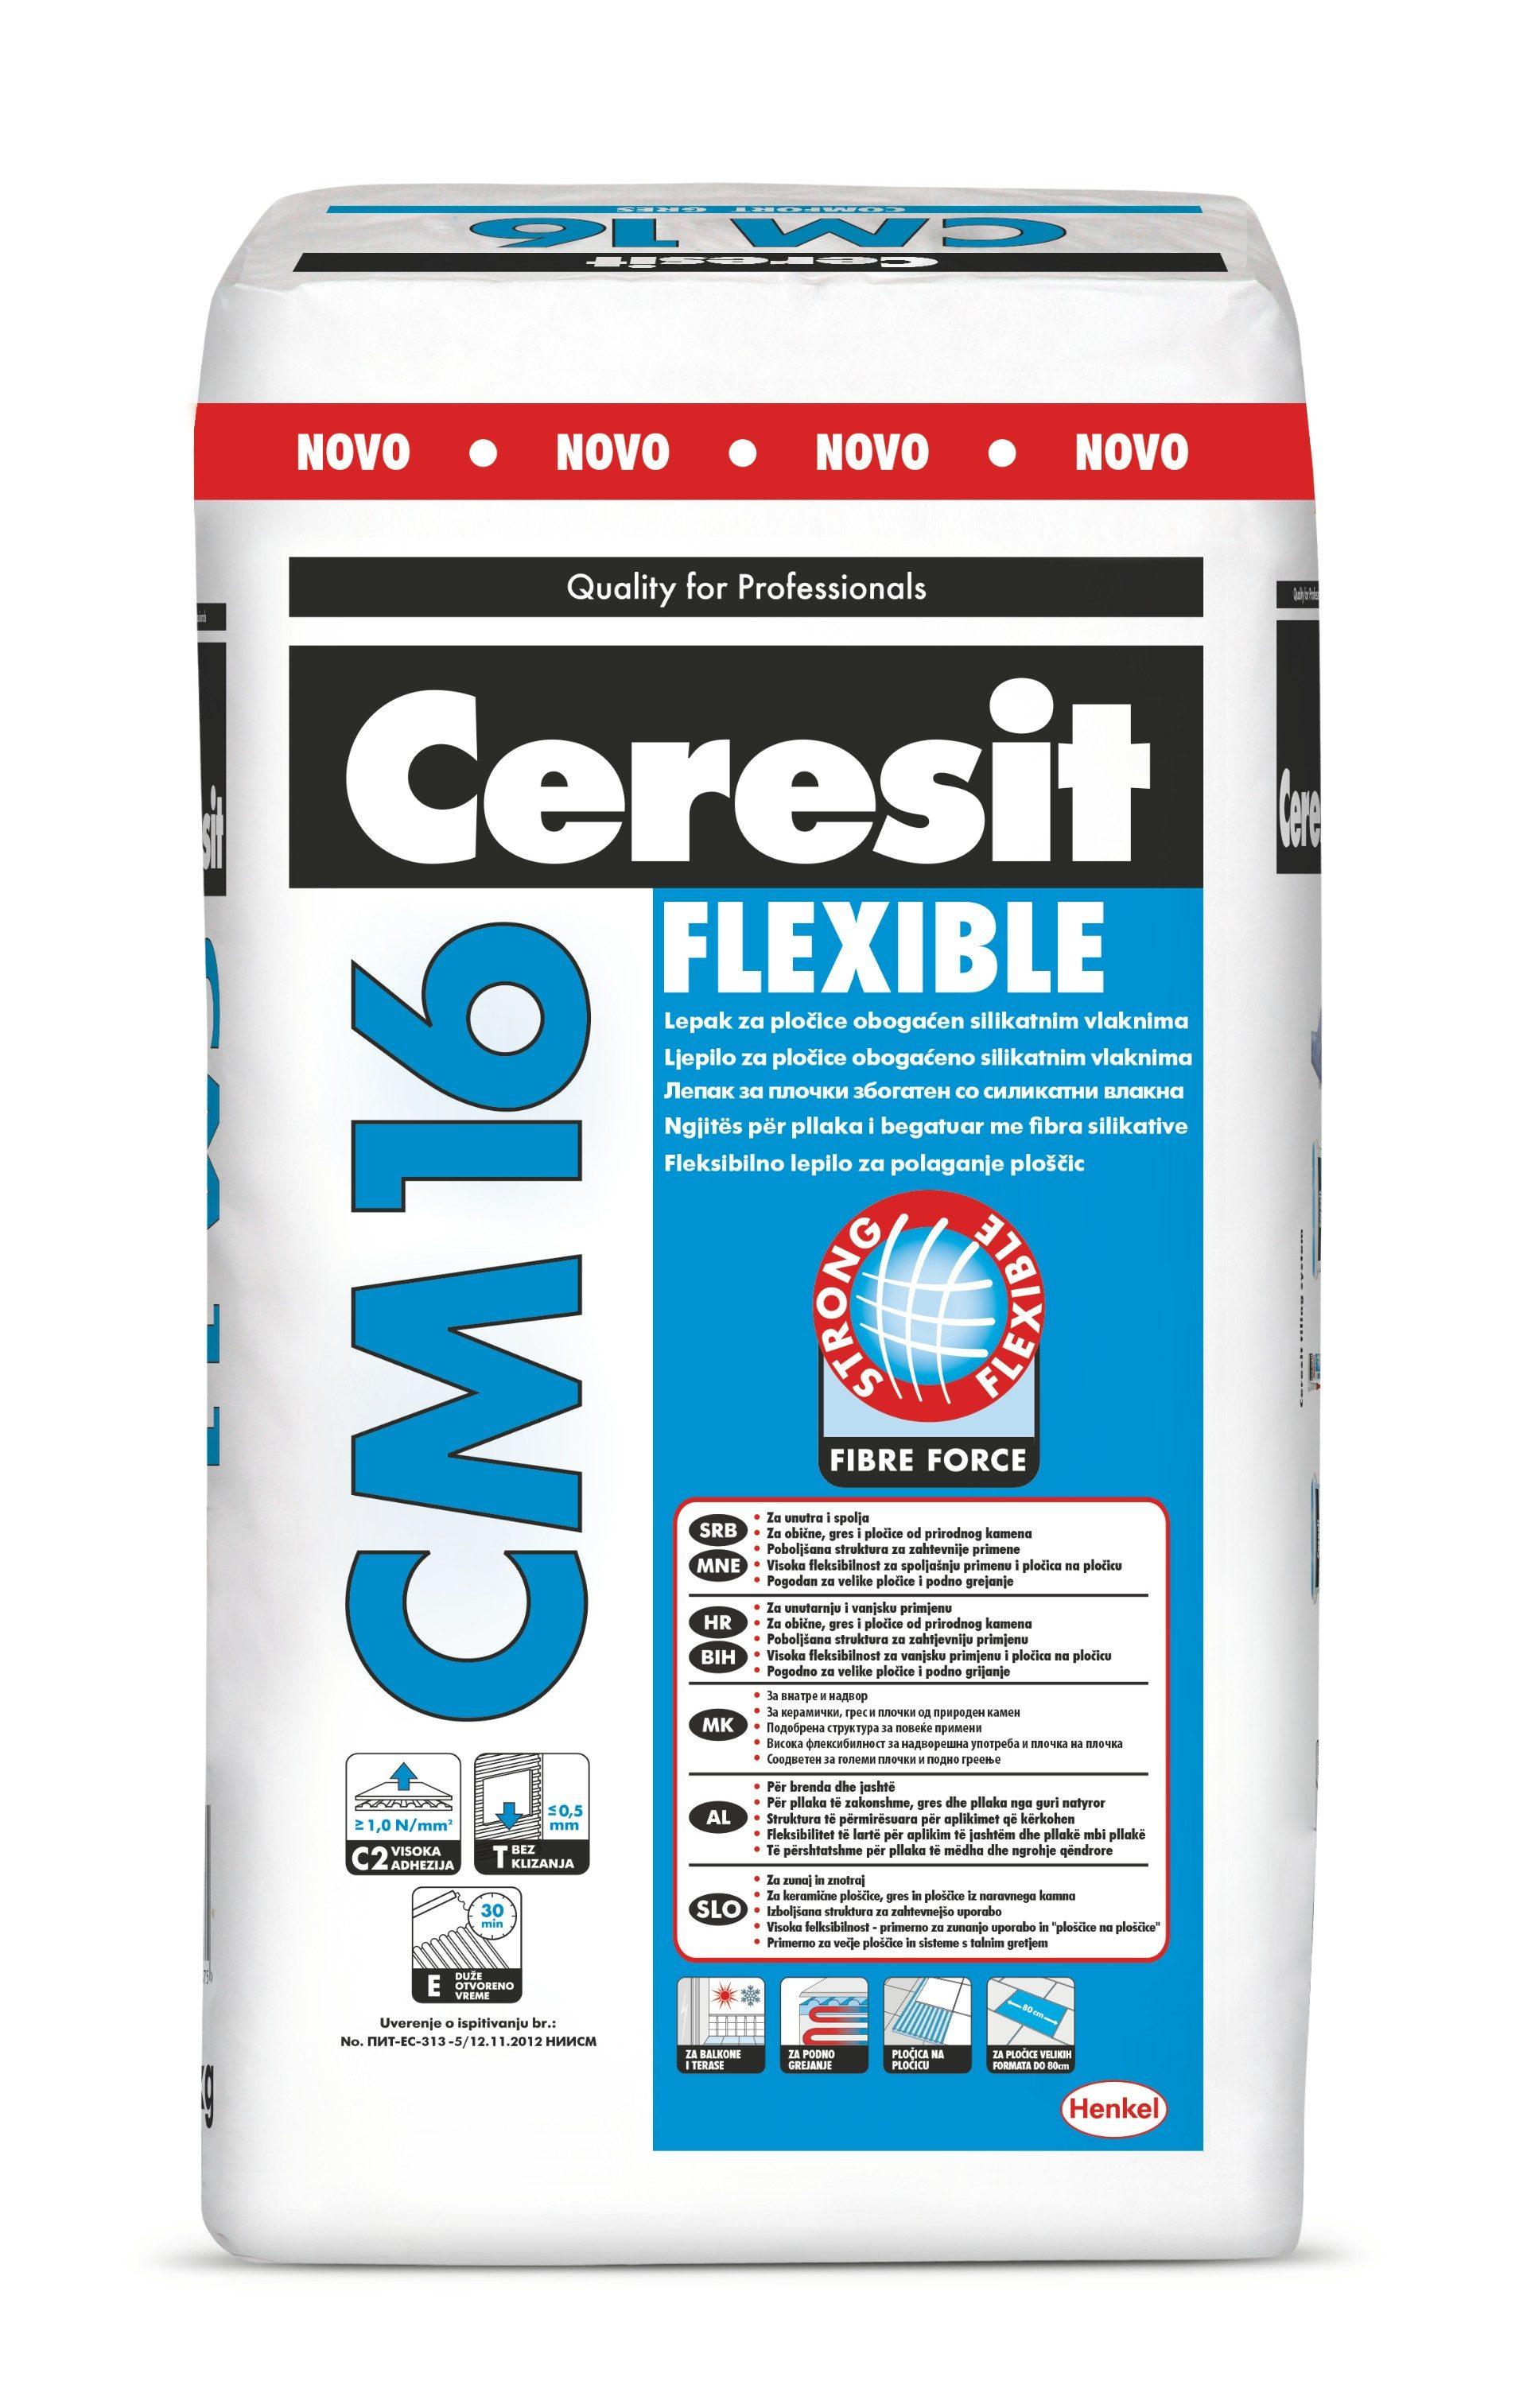 Fleksibilno ljepilo za keramiku, CM 16, 25 kg, CERESIT